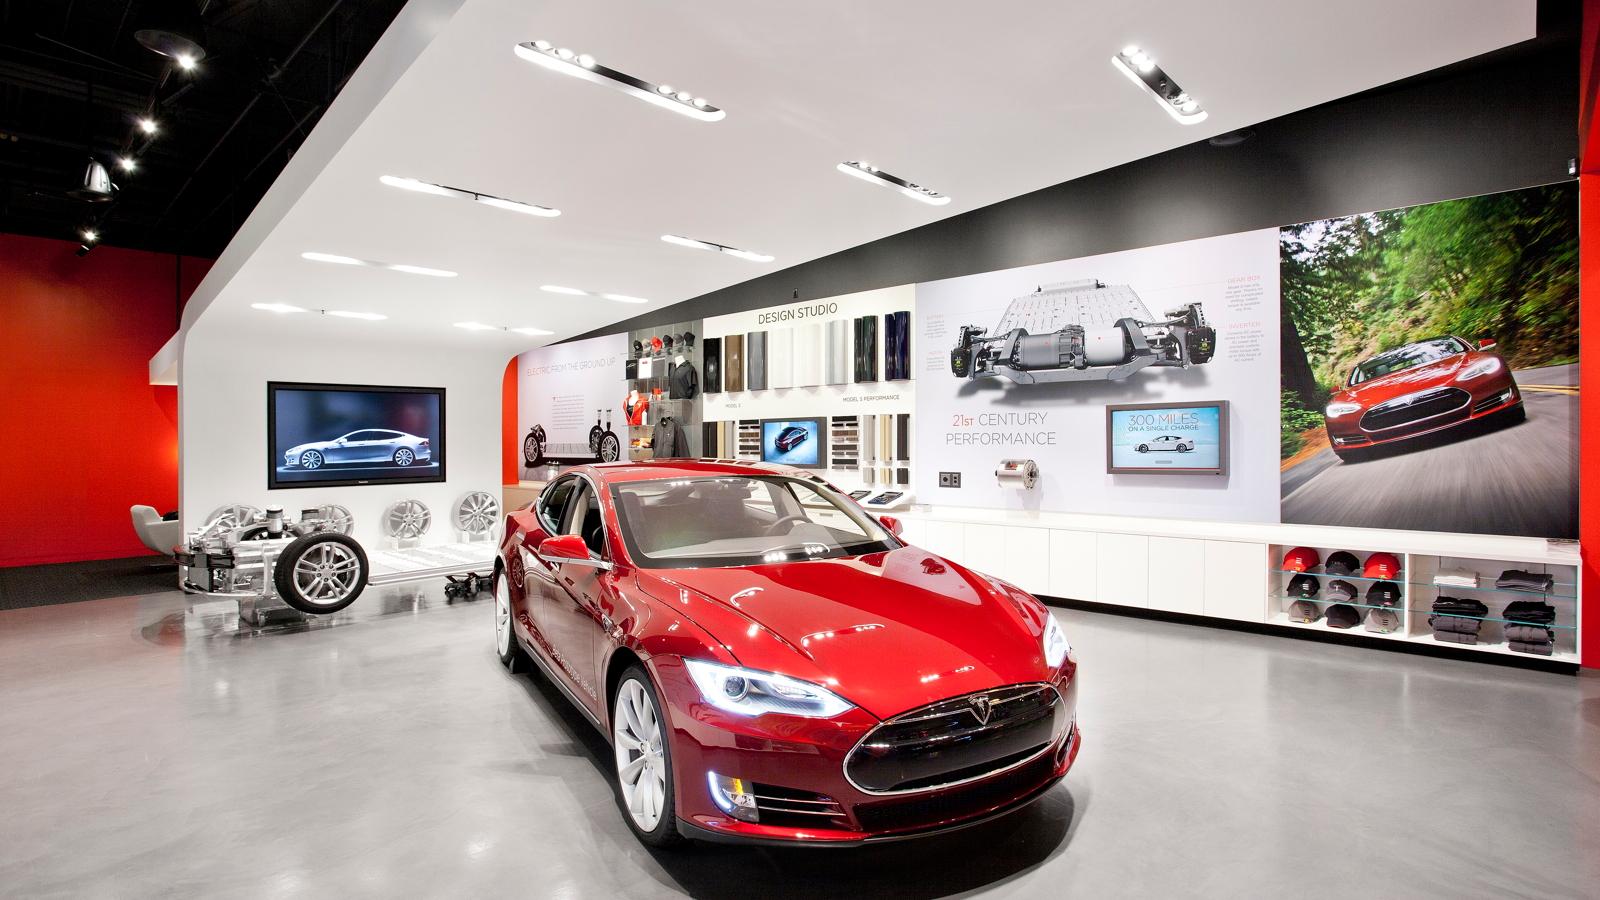 Tesla's retail store concept